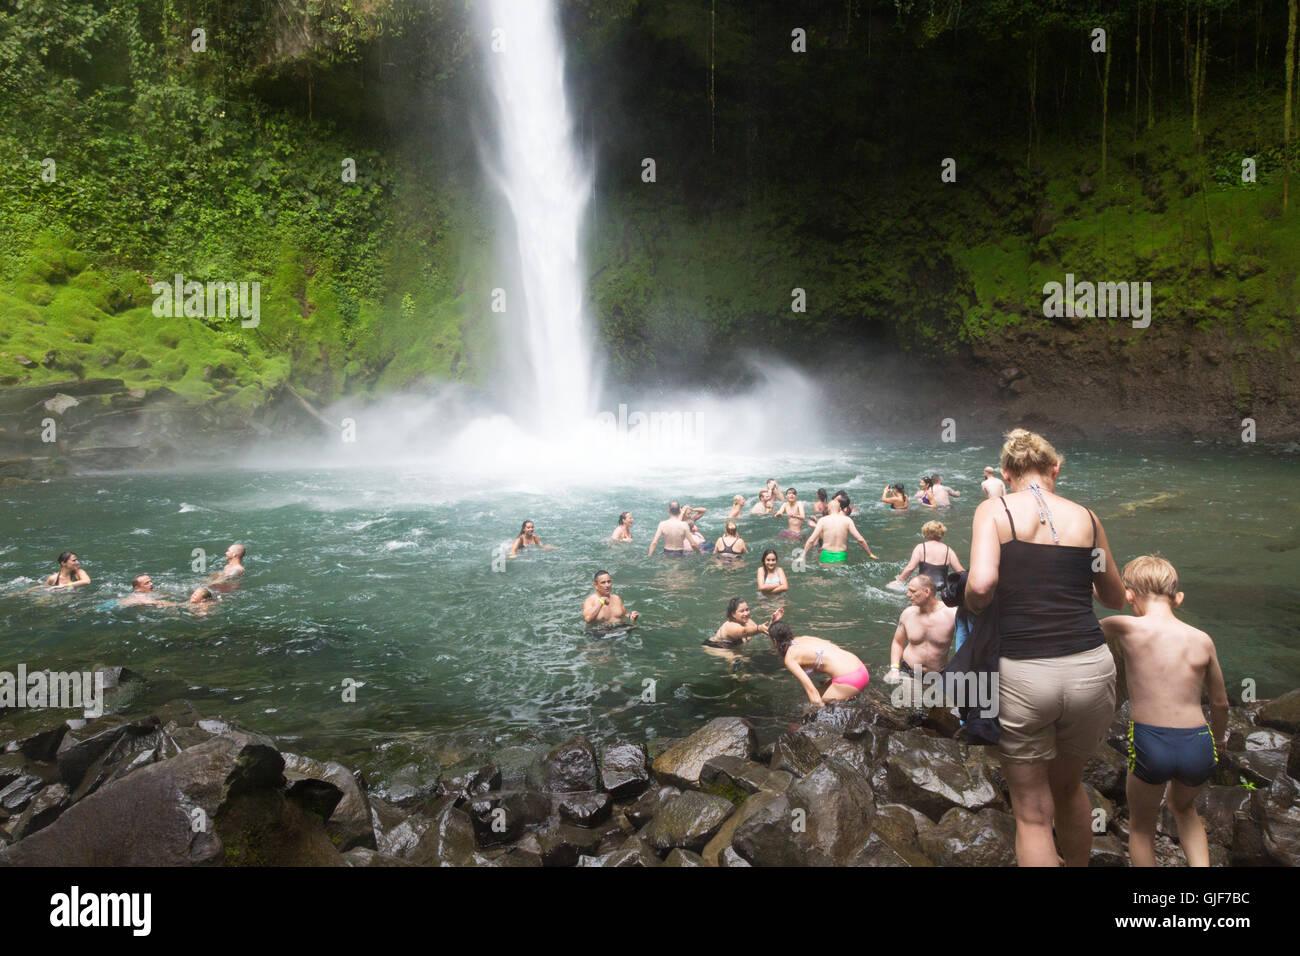 Les touristes la natation dans la cascade de La Fortuna, la Fortuna, Arenal, Costa Rica, province de l'Amérique Photo Stock